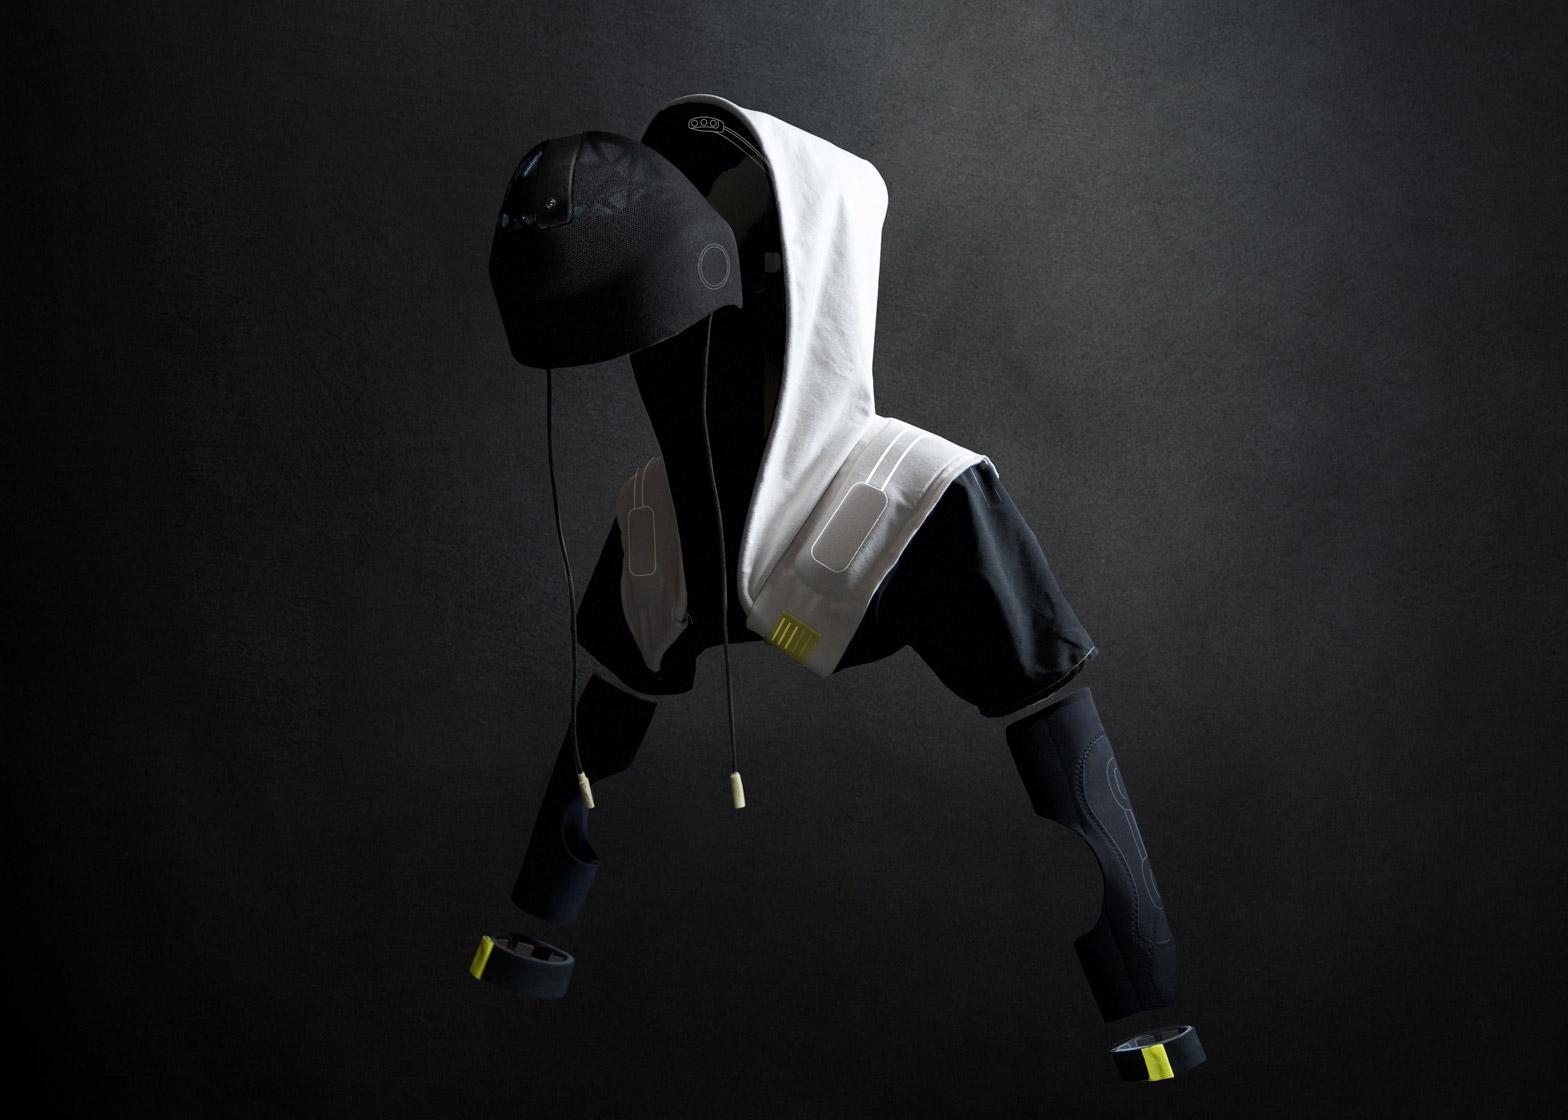 vr-hoodie-artefact-design-technology-virtual-reality-gaming_dezeen_1568_7